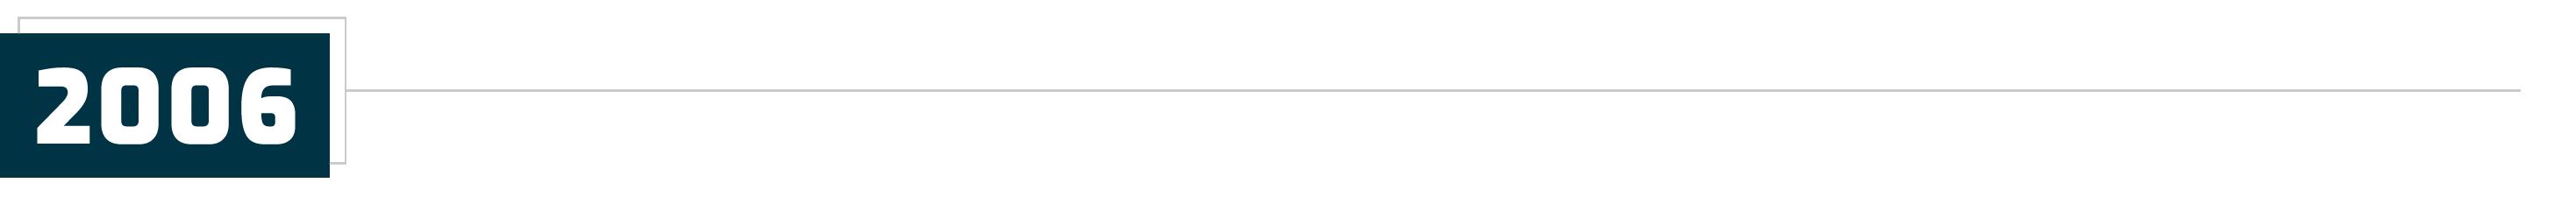 Choice Bank Timeline 2006